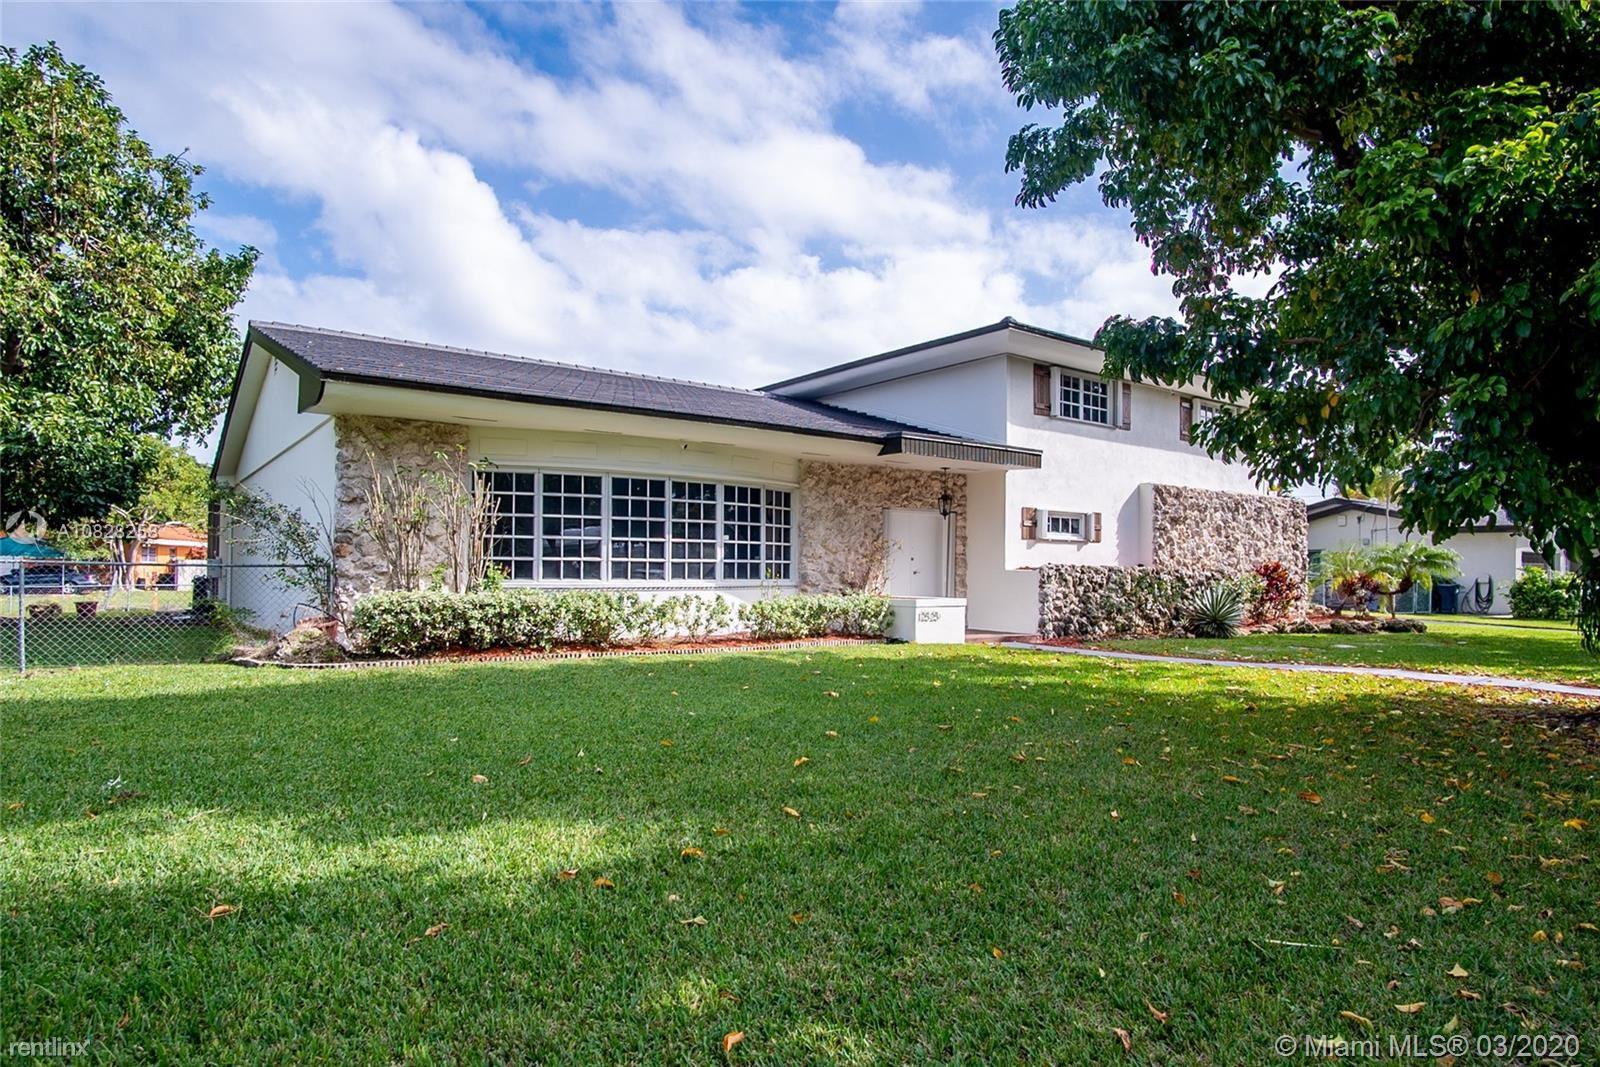 12525 SW 71st Ave, Pinecrest, FL - $5,000